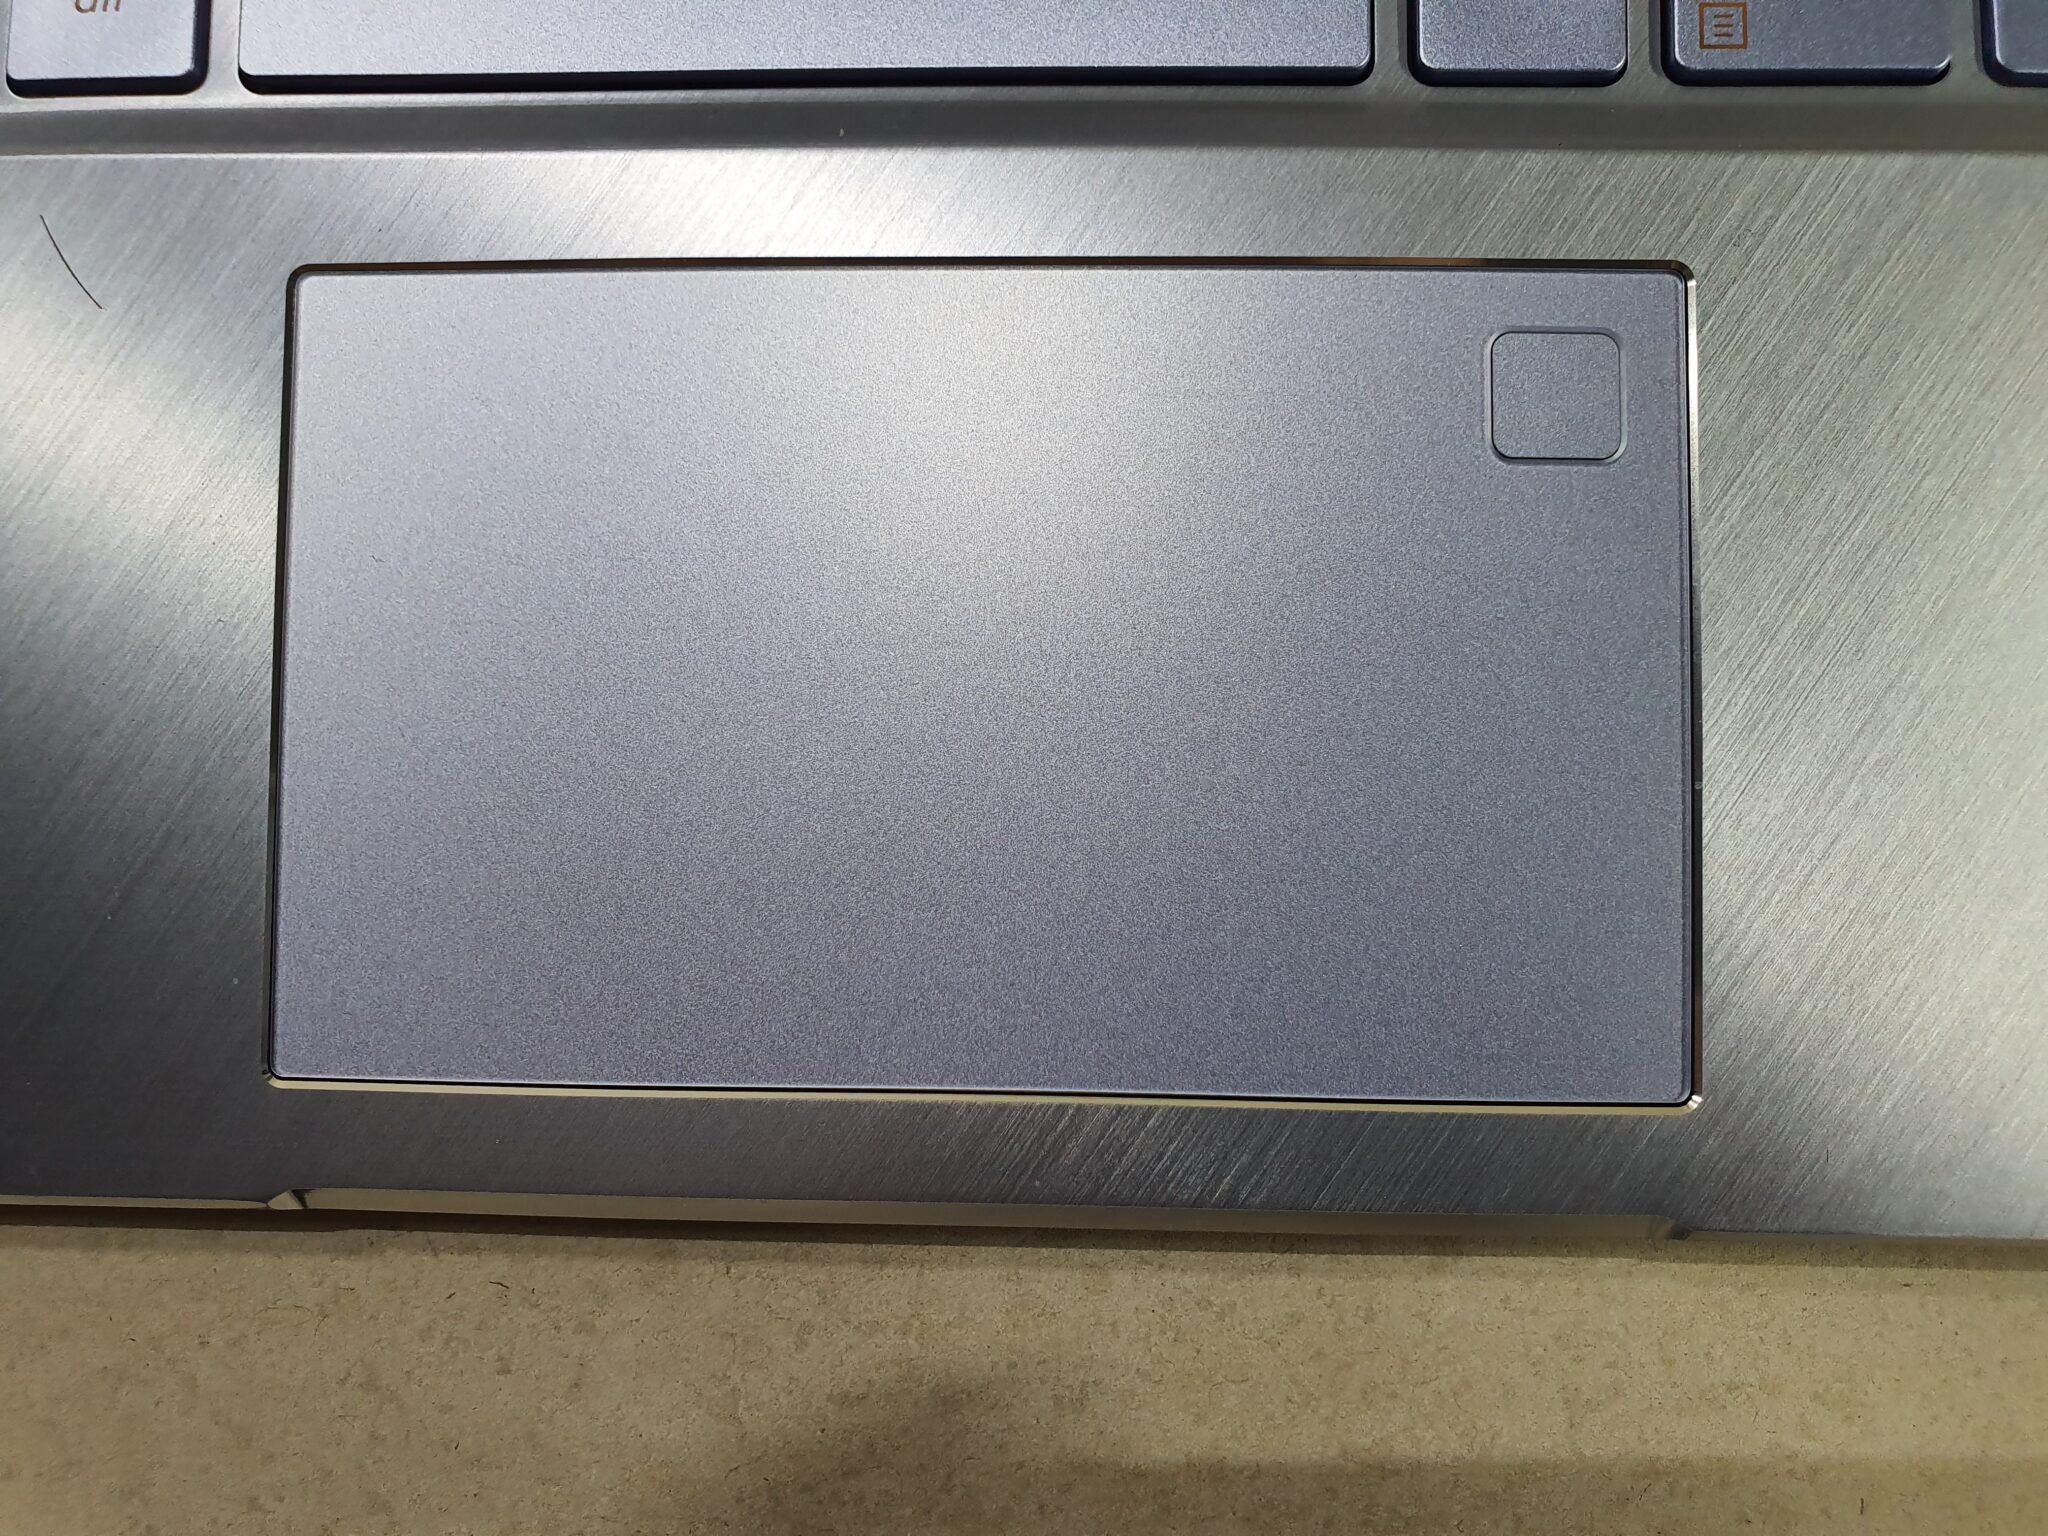 Asus ZenBook 14 UM431 touchpad